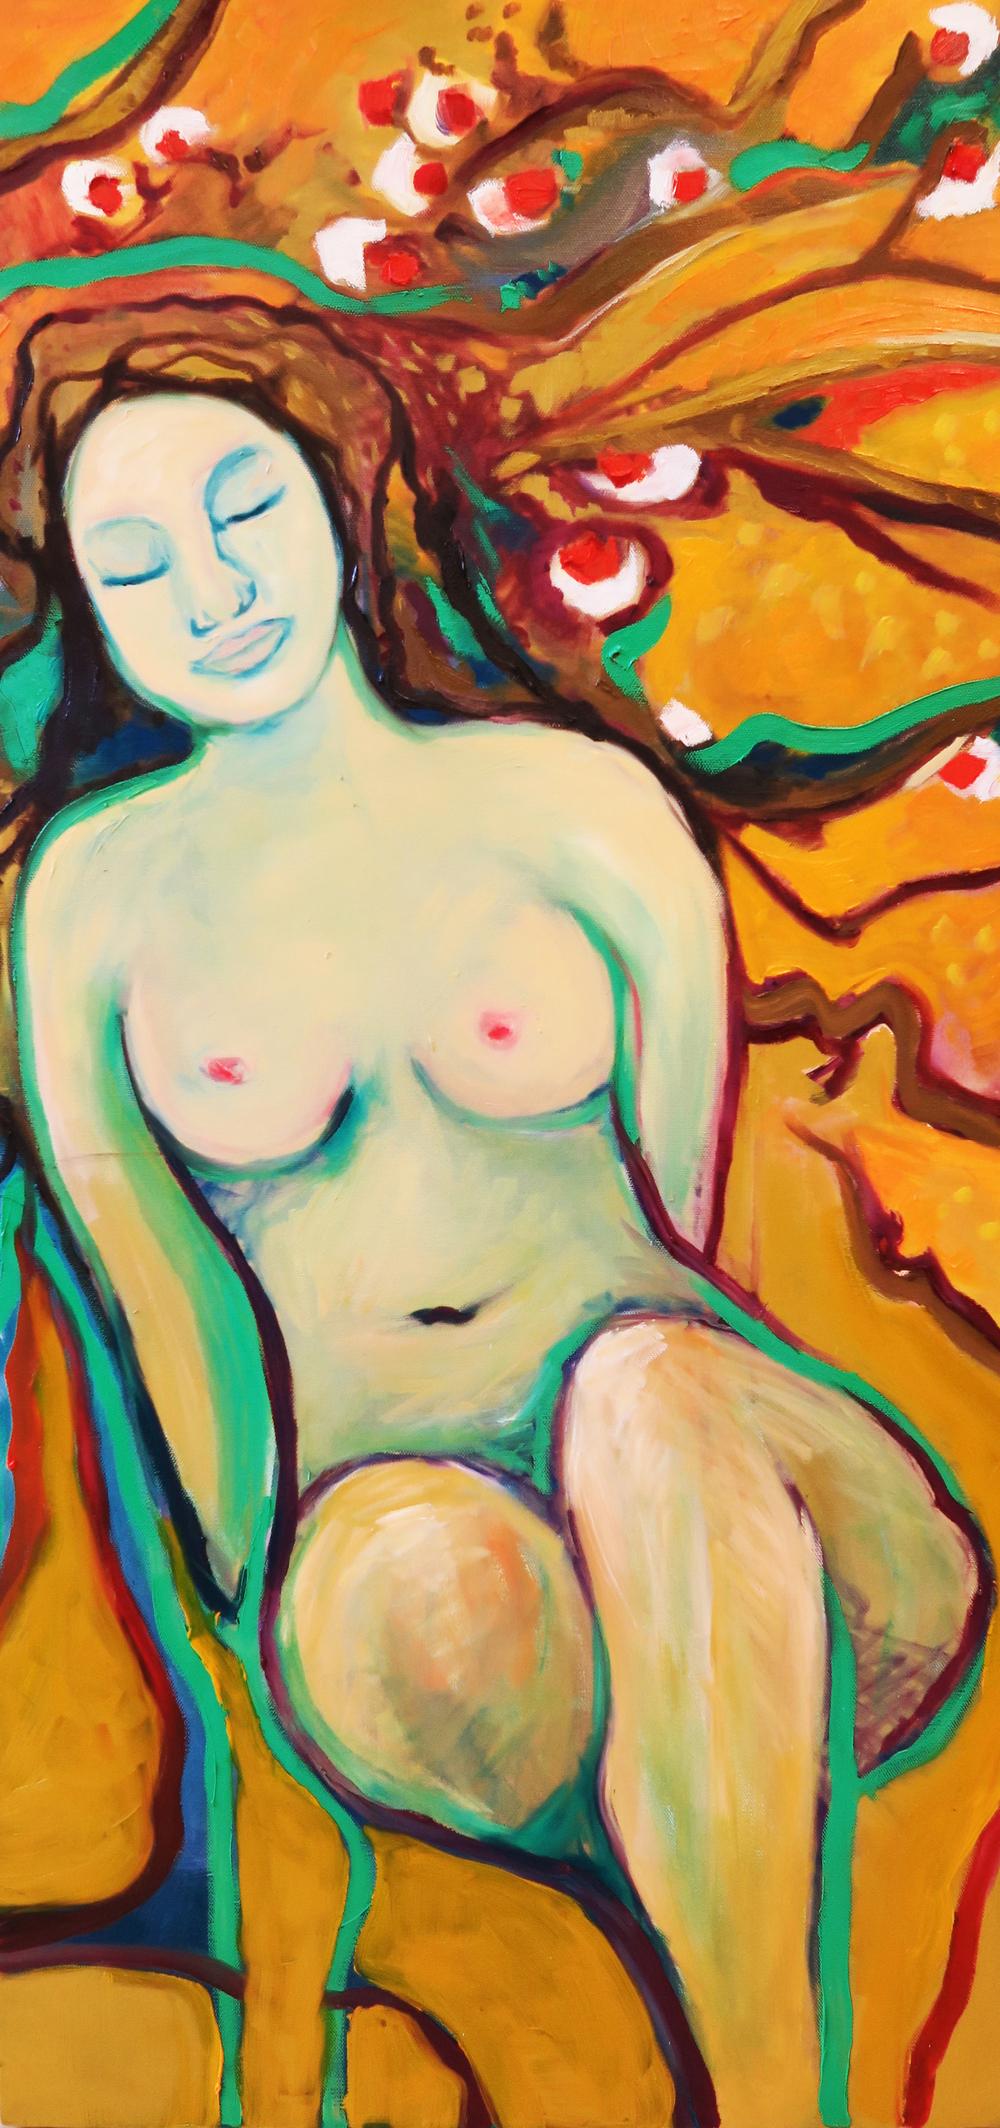 -  SOLD -47. Tangerine ,2015 (50 x 100 x 3.8cm)